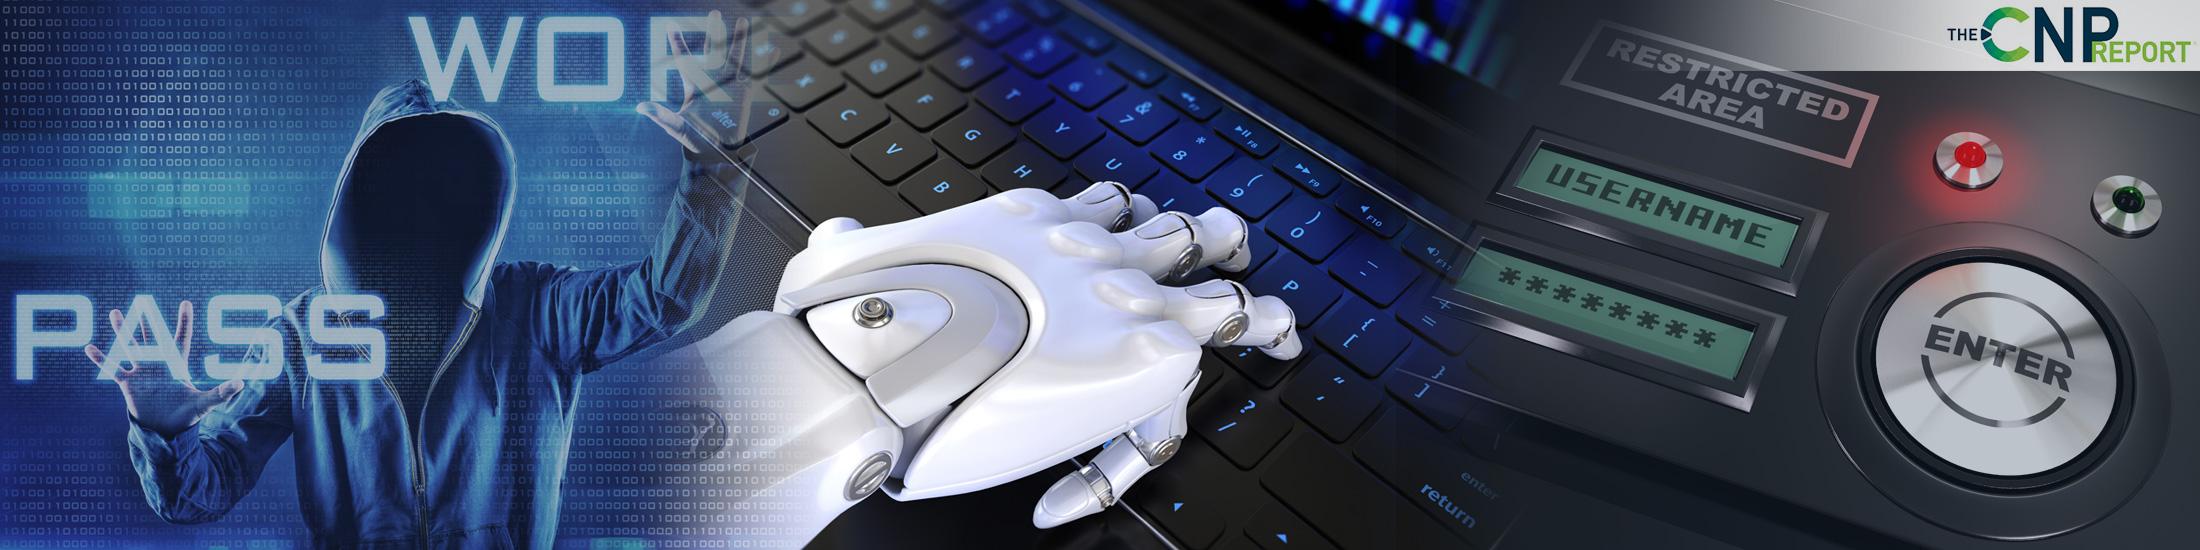 Bots, Specialization Supercharging ATO Attacks